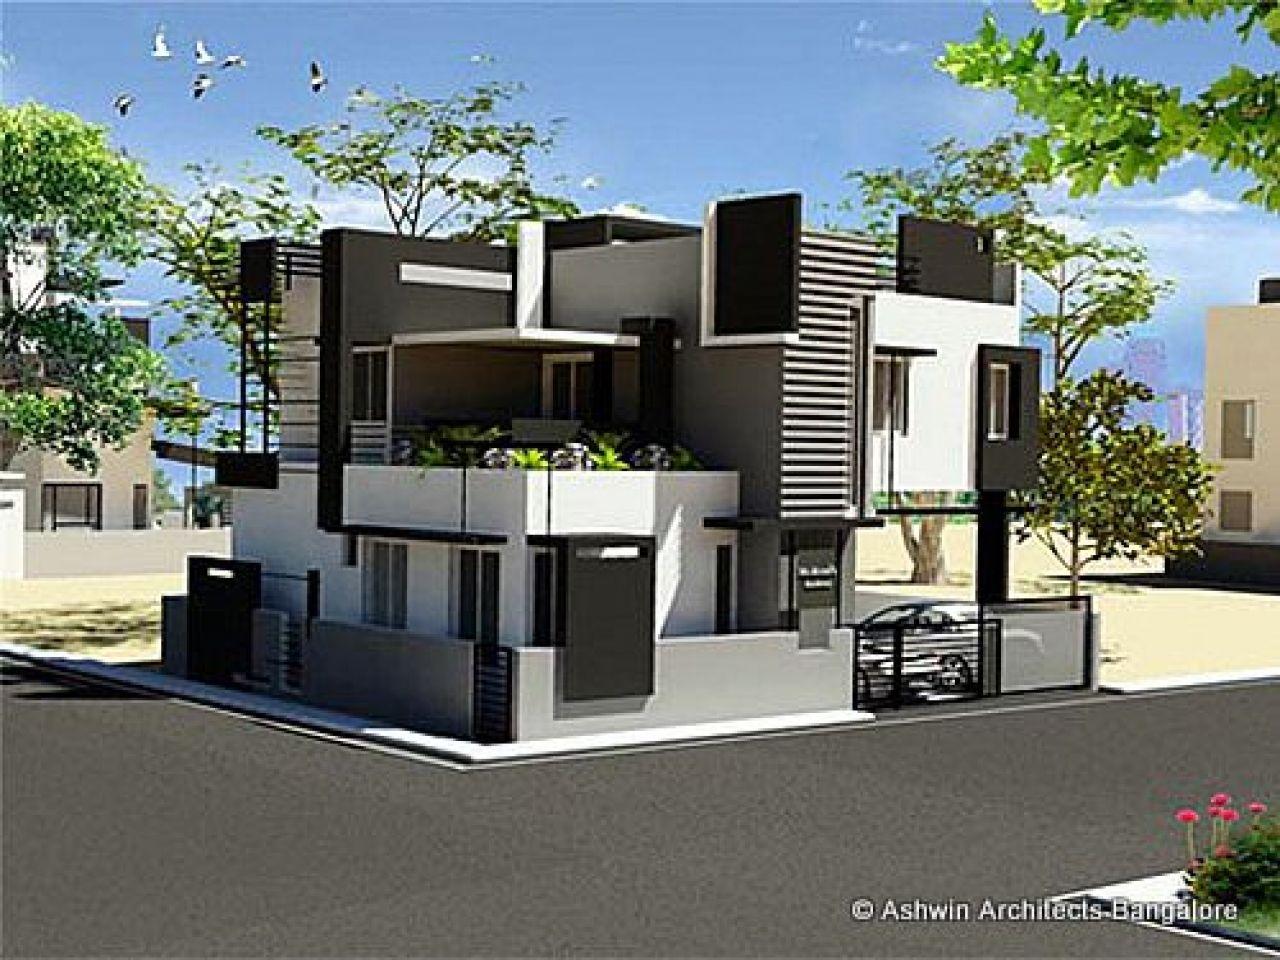 ICYMI: 4 Bedroom Bungalow Architectural Design In Nigeria